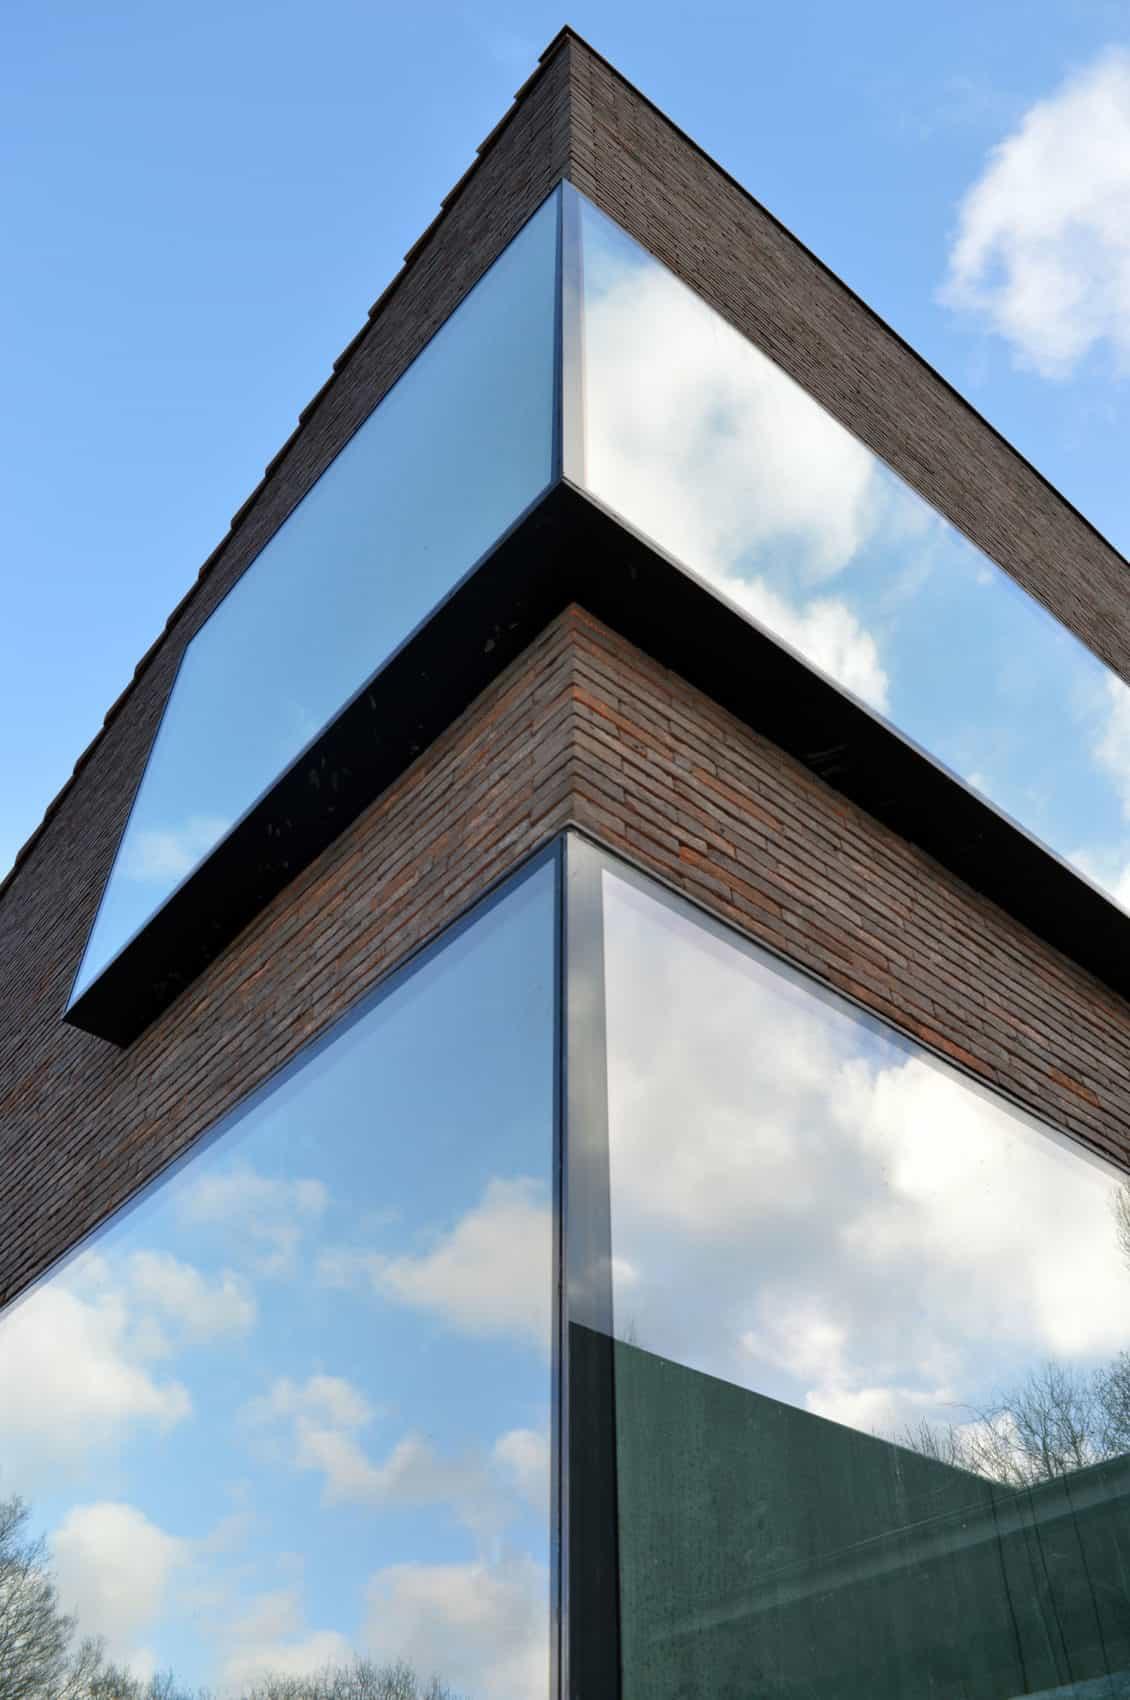 F&C Kiekens by Architektuurburo Dirk Hulpia (4)